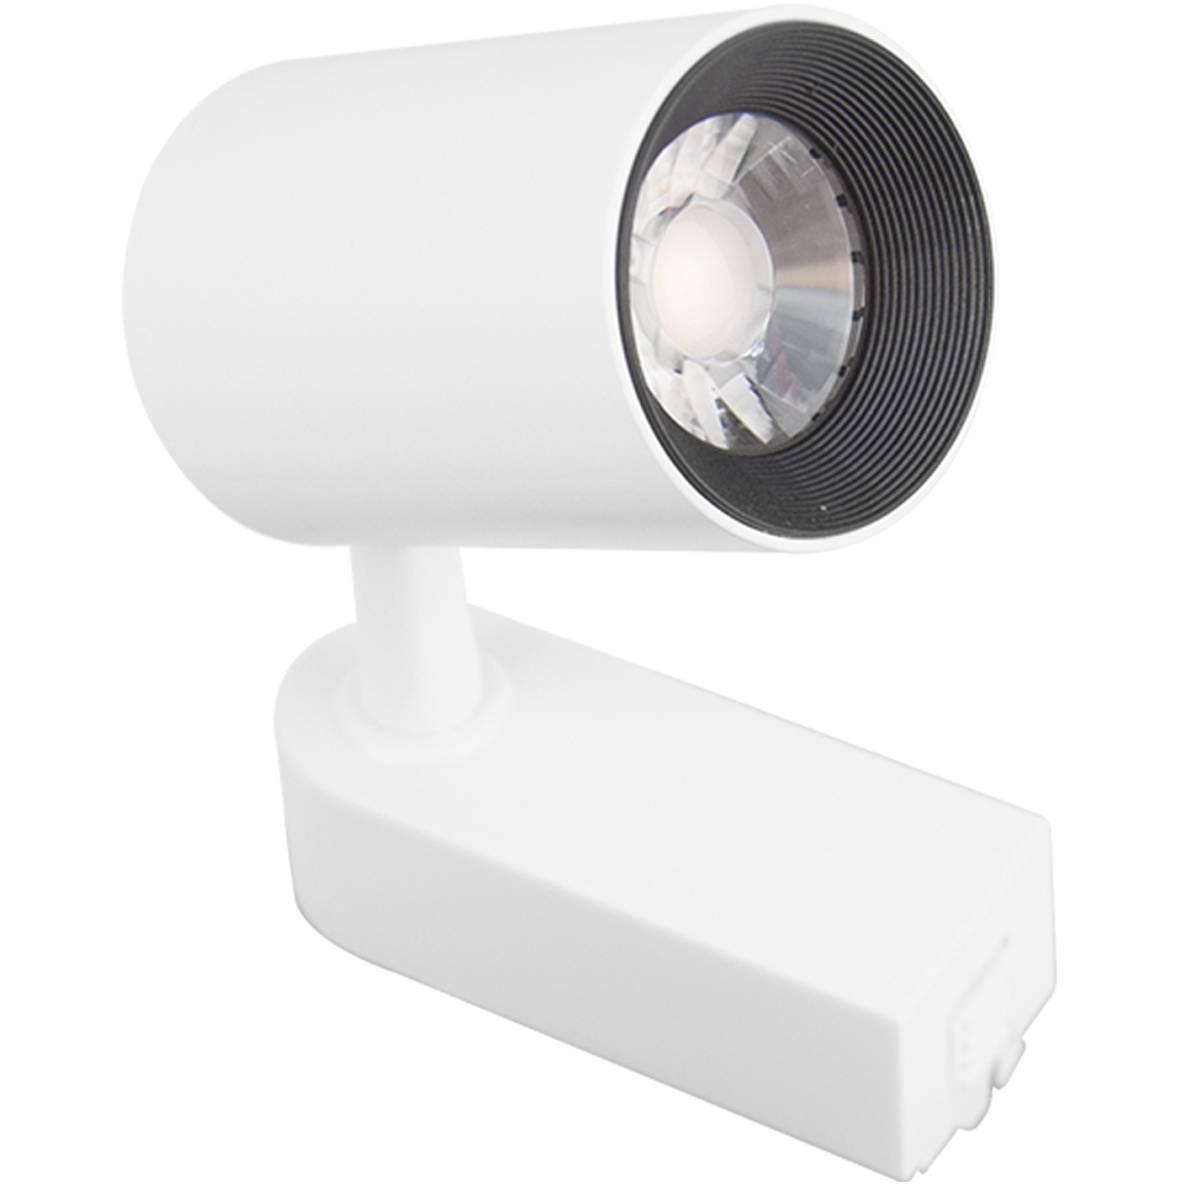 Kit Trilho Eletrificado 1 Metro Branco + 3 Spots Led 7w Bran - LCGELETRO